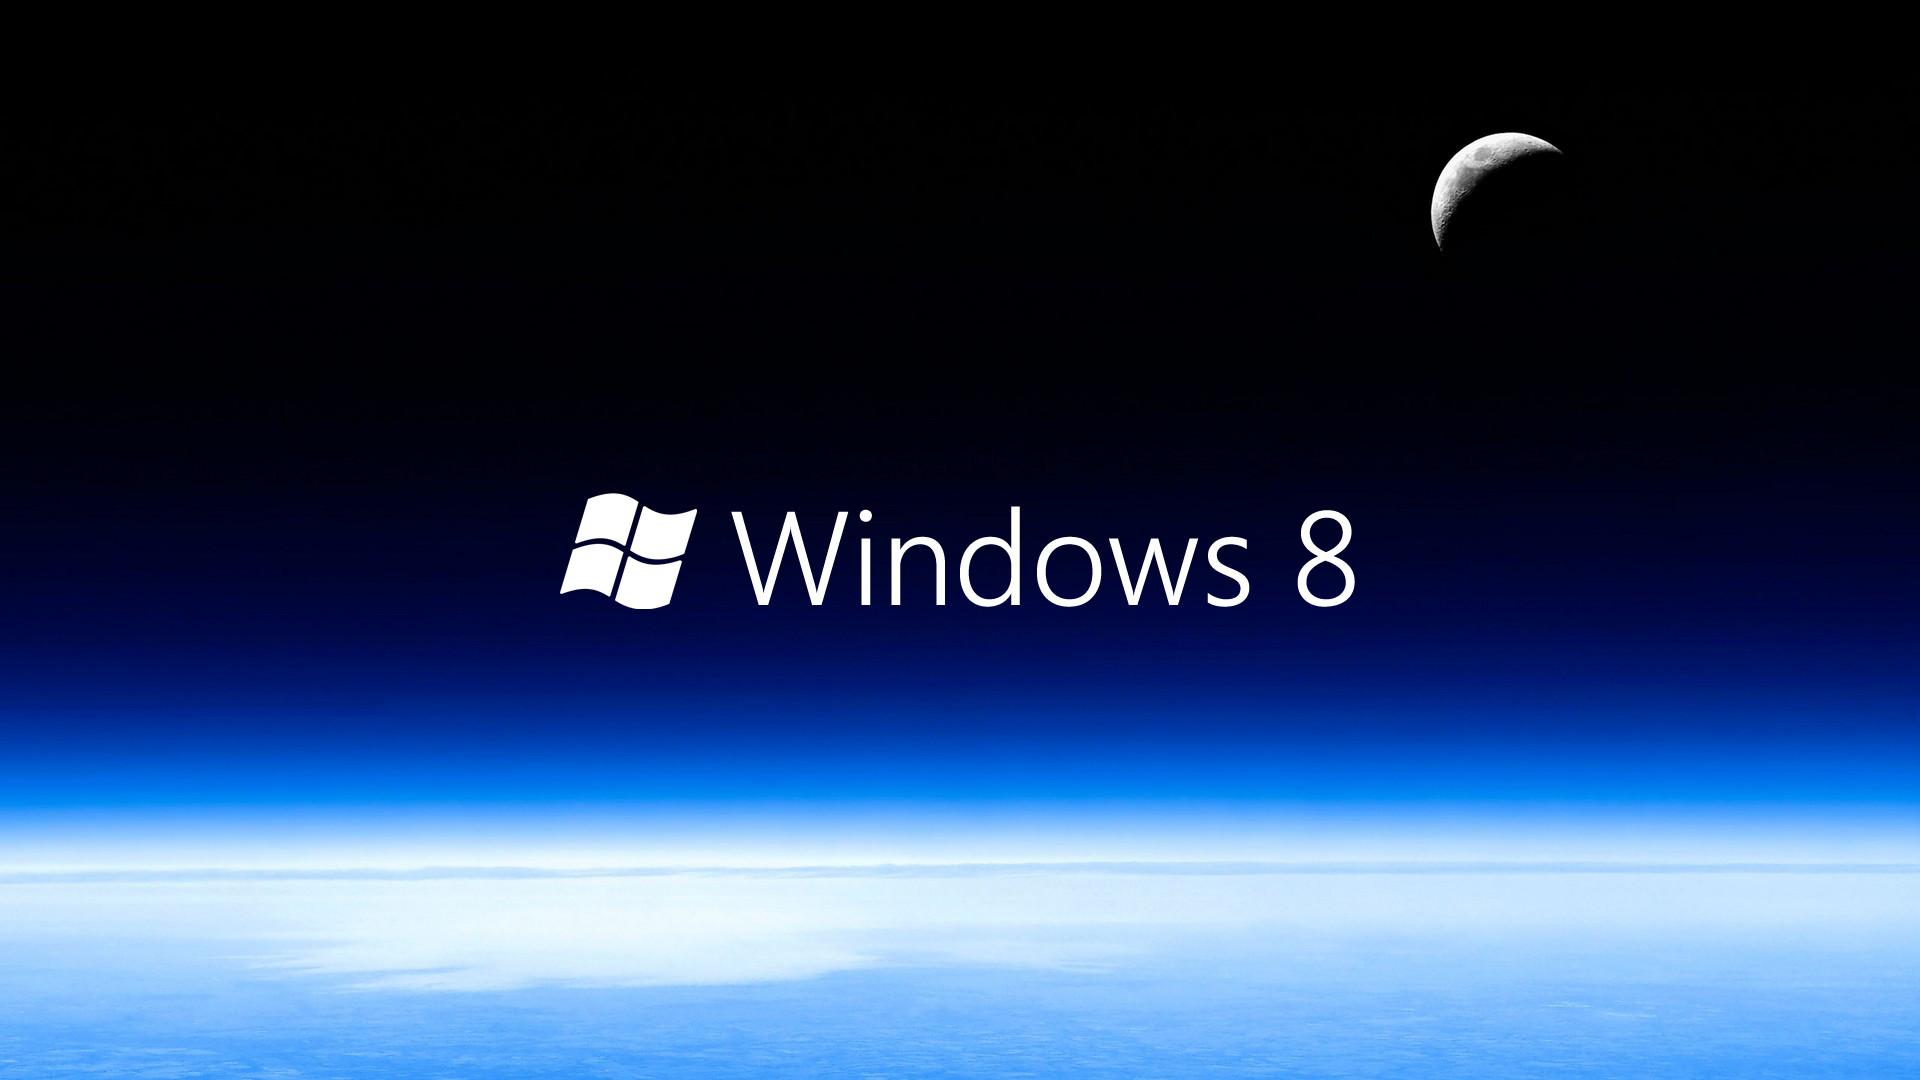 Microsoft Wallpaper Themes Windows 8